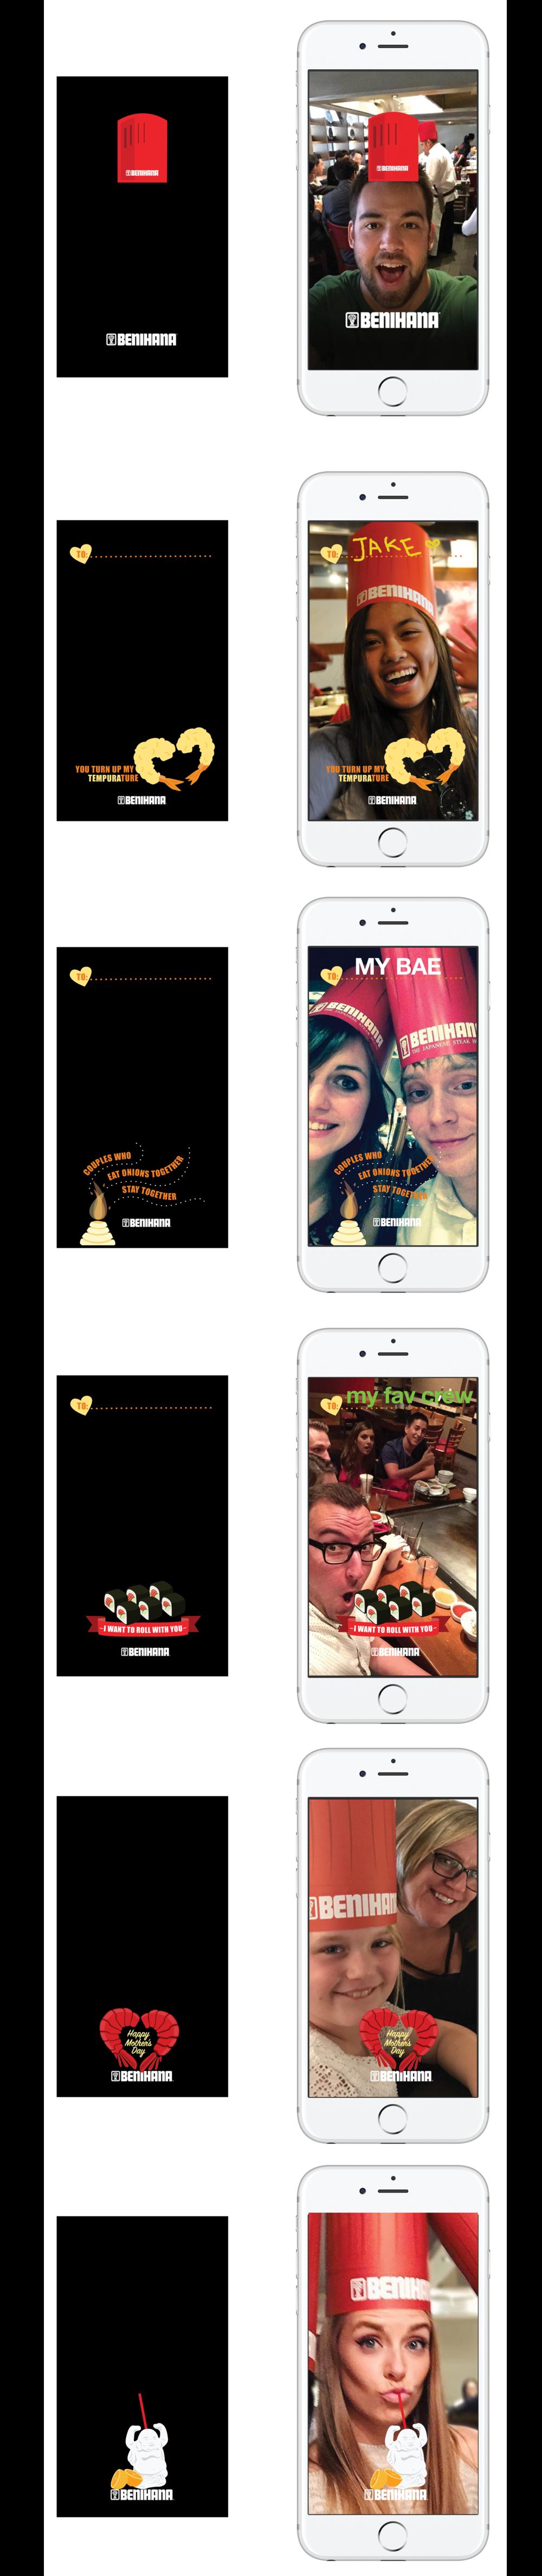 snapchat-filter-in-situ_02-.png